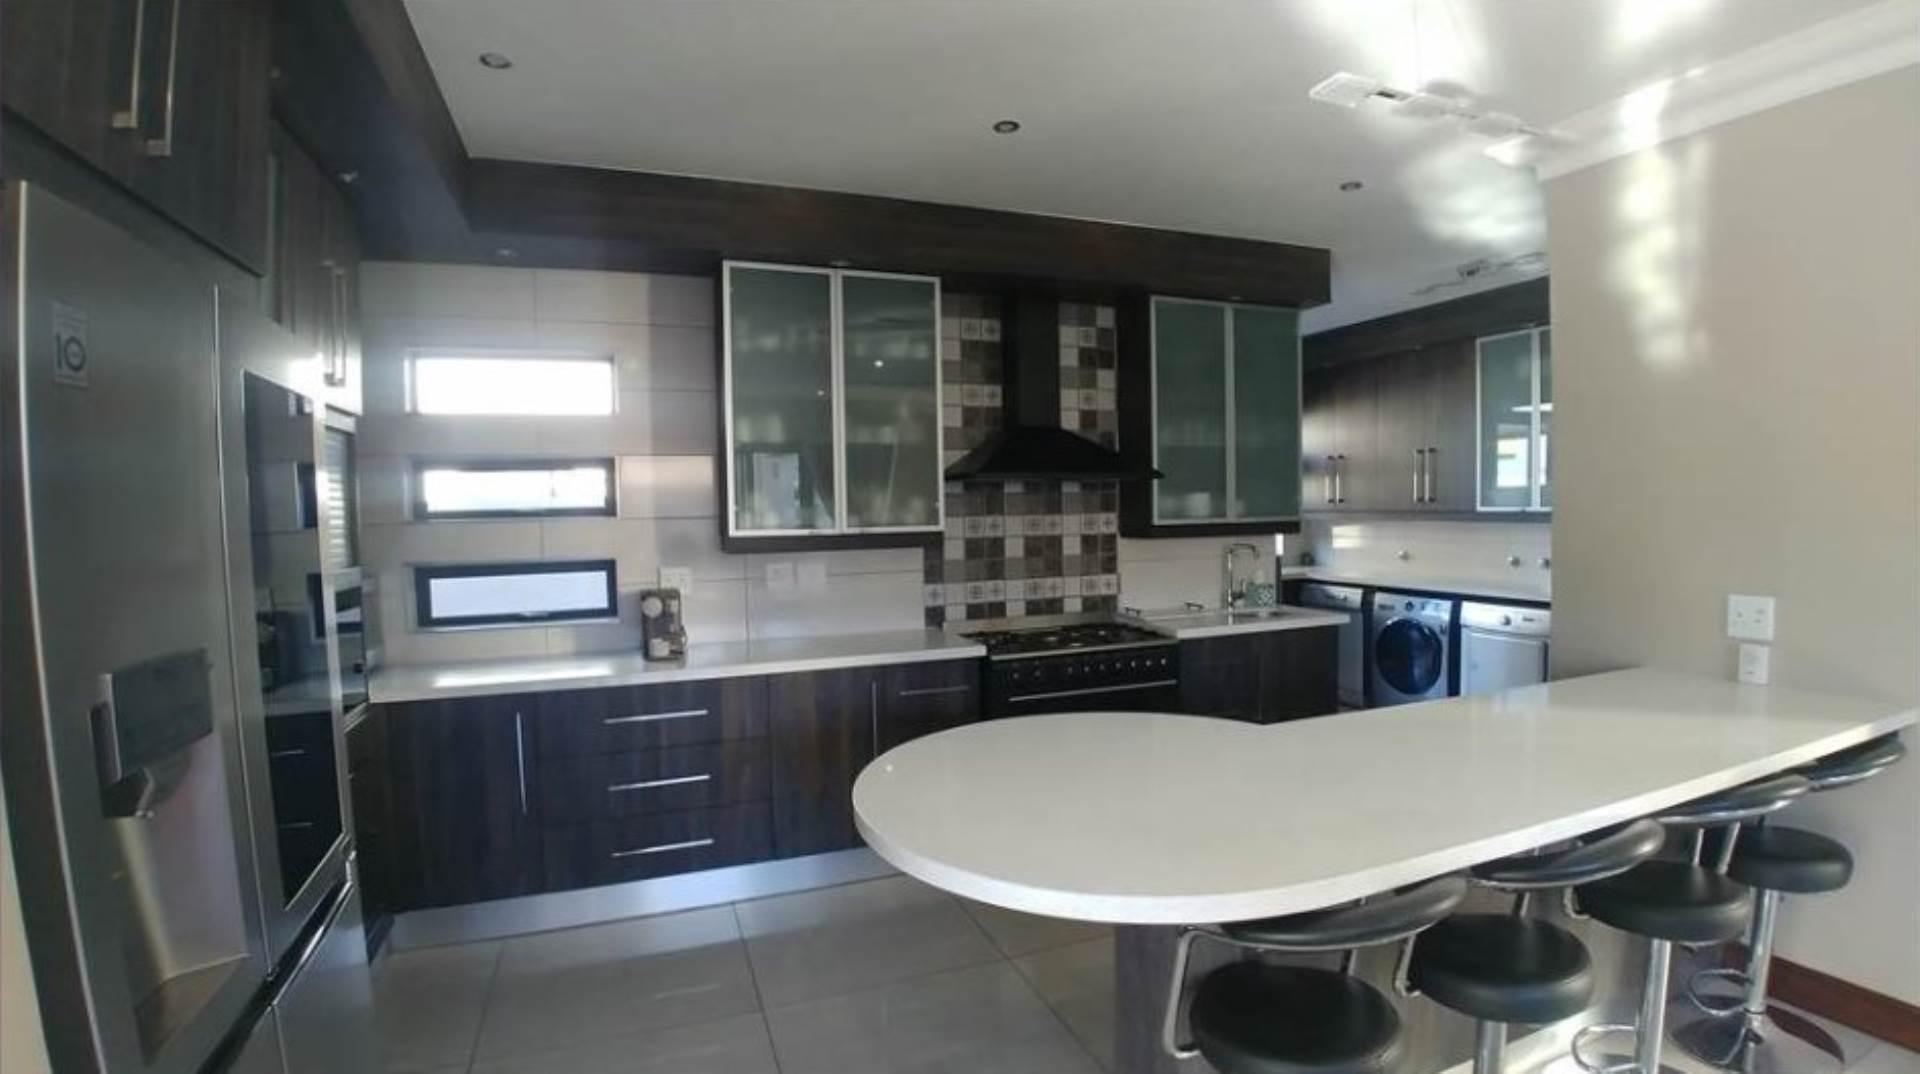 House To Rent In Midstream Ridge, Centurion, Gauteng for R 41,000 /month